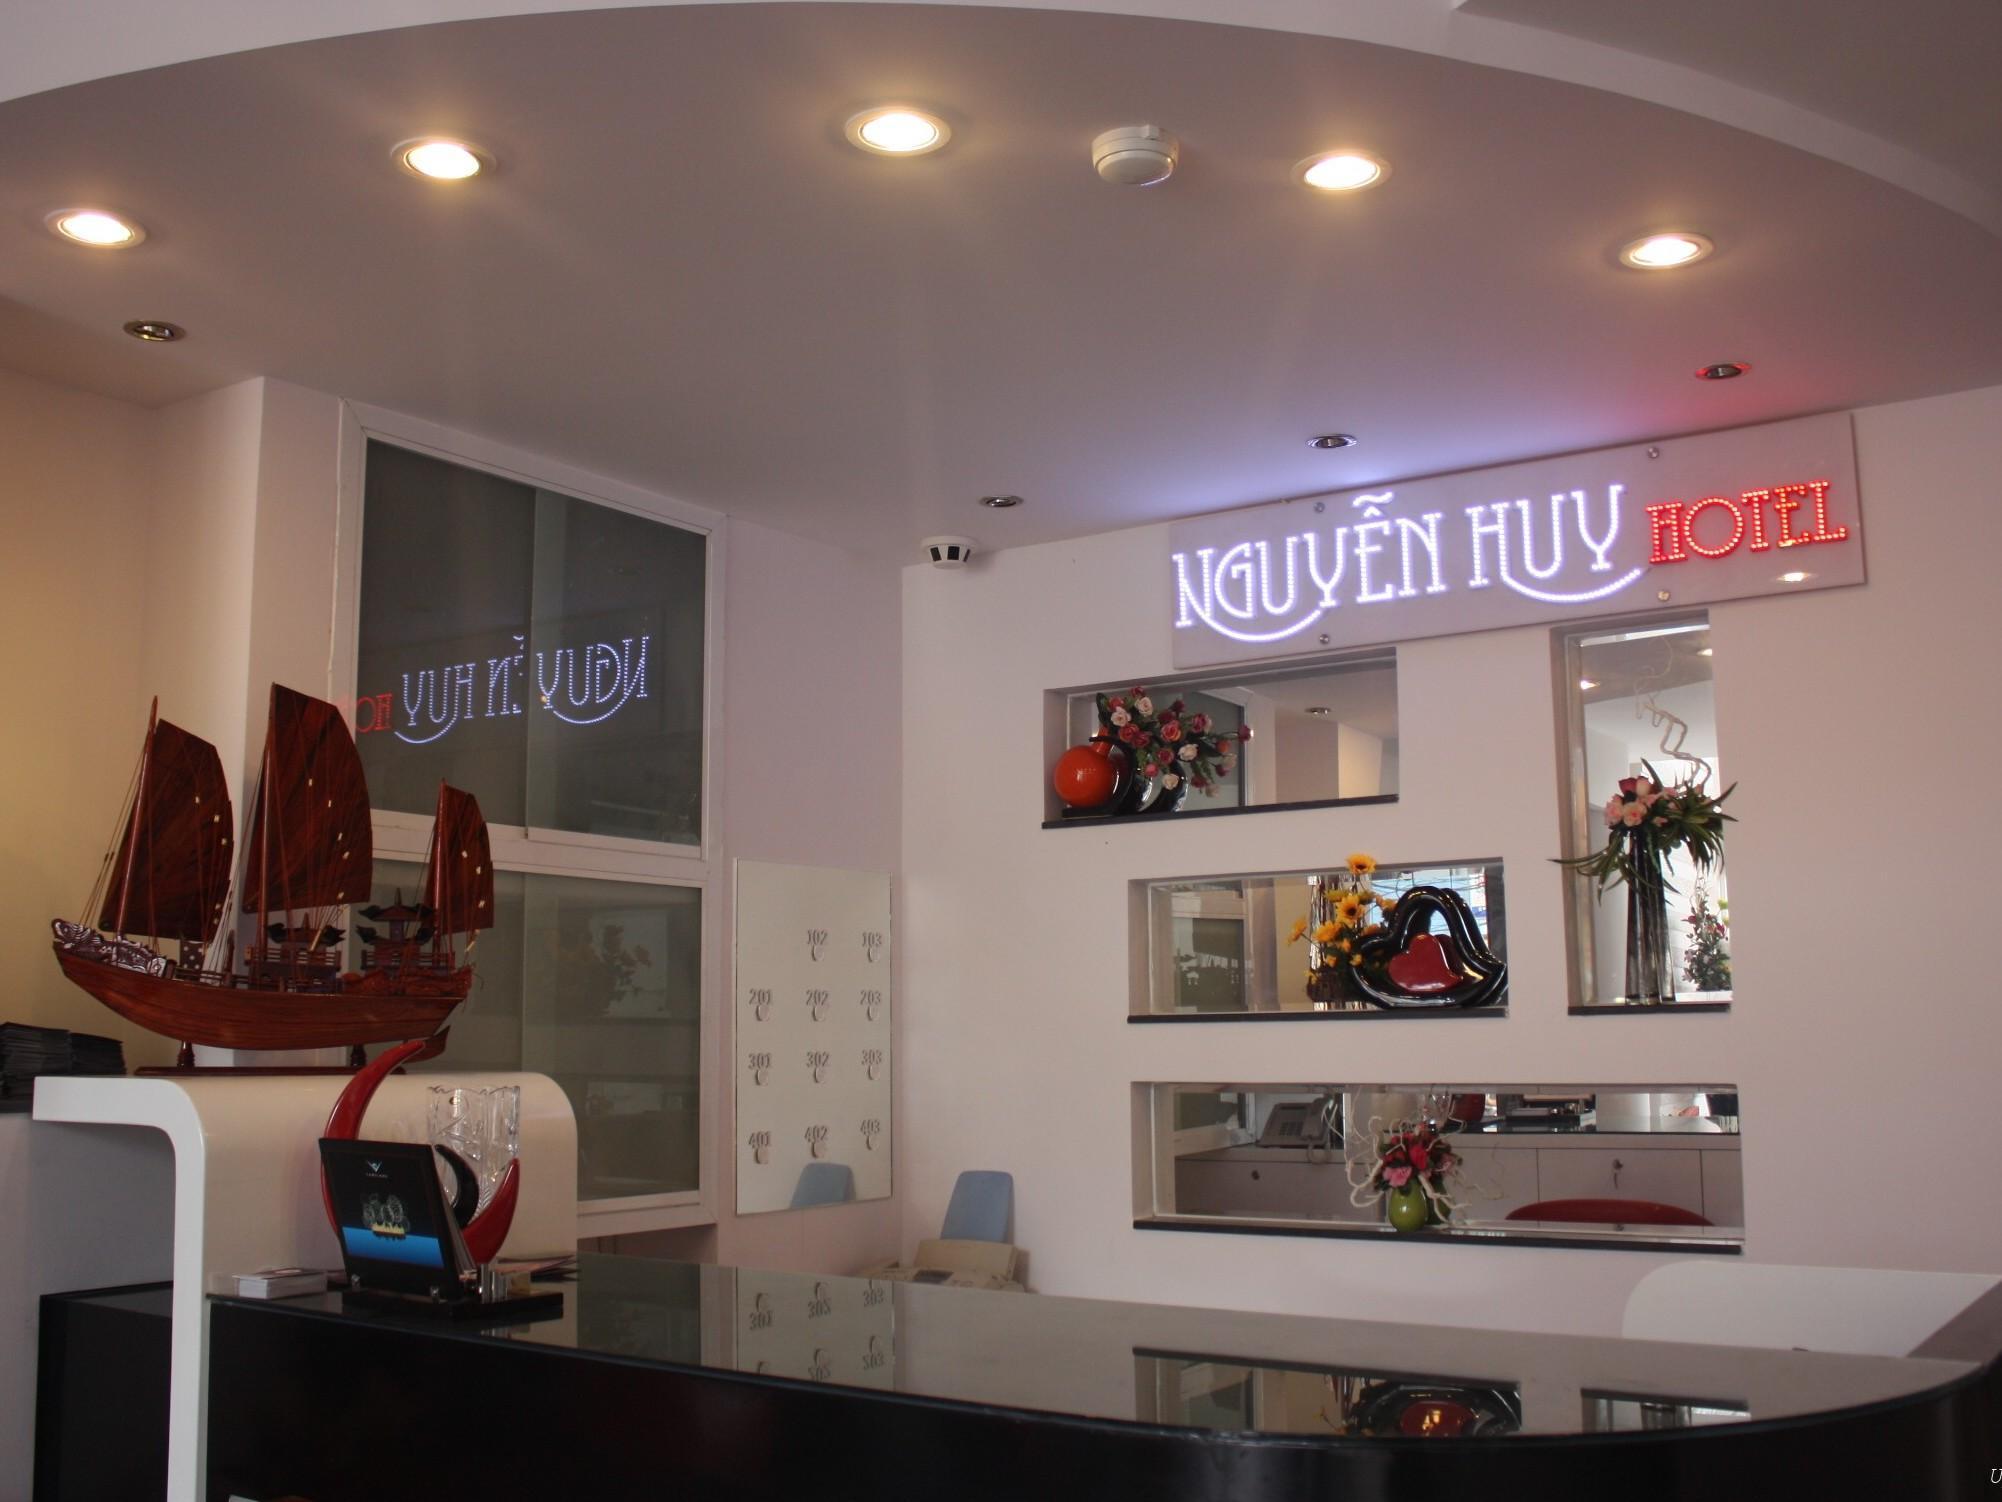 Nguyen Huy Hotel